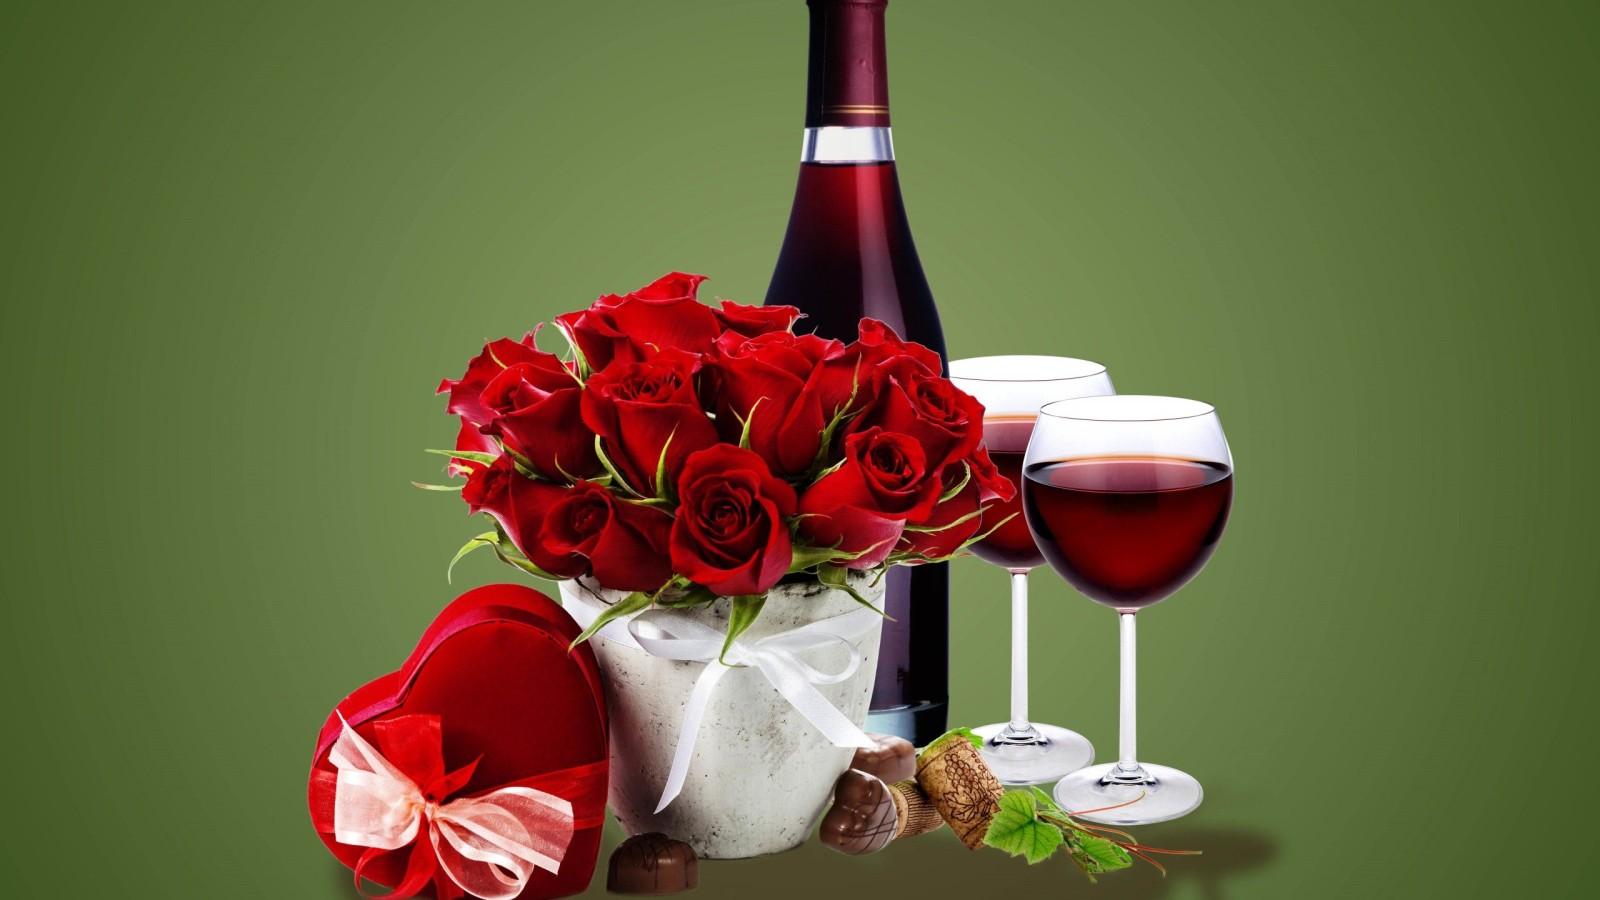 rose wine glasses and bottles